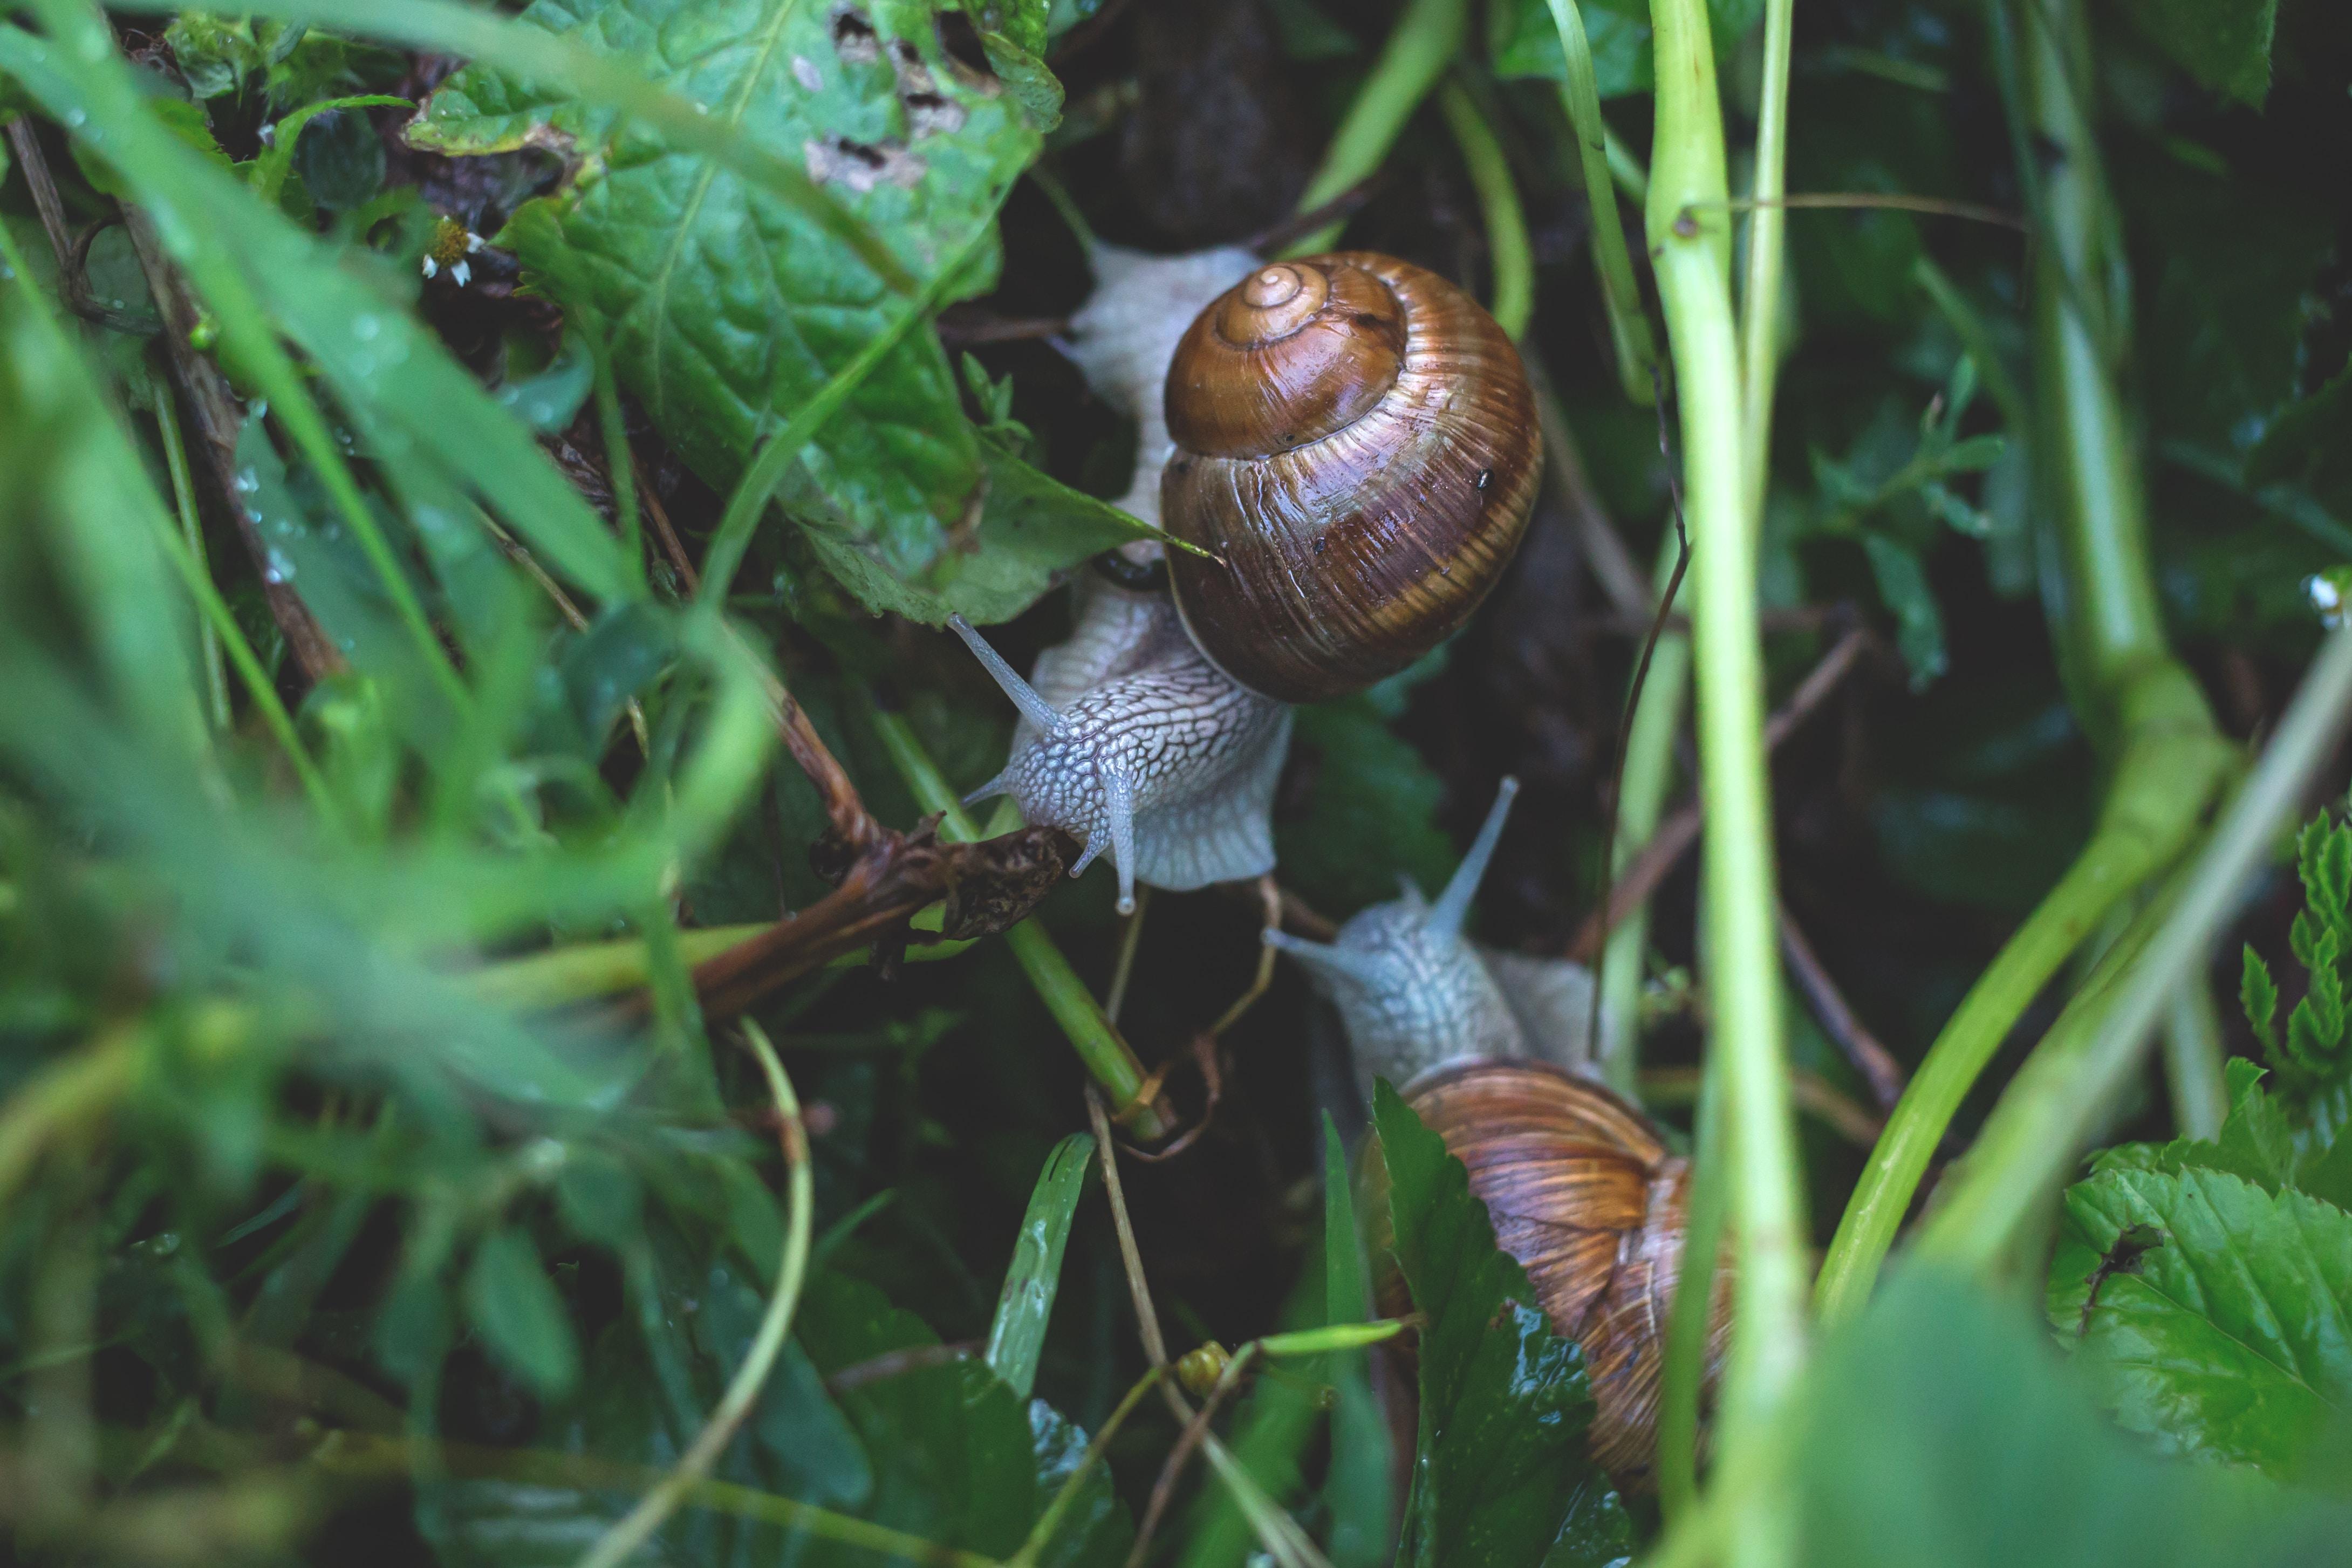 Snails slowly make their way through the wet grass